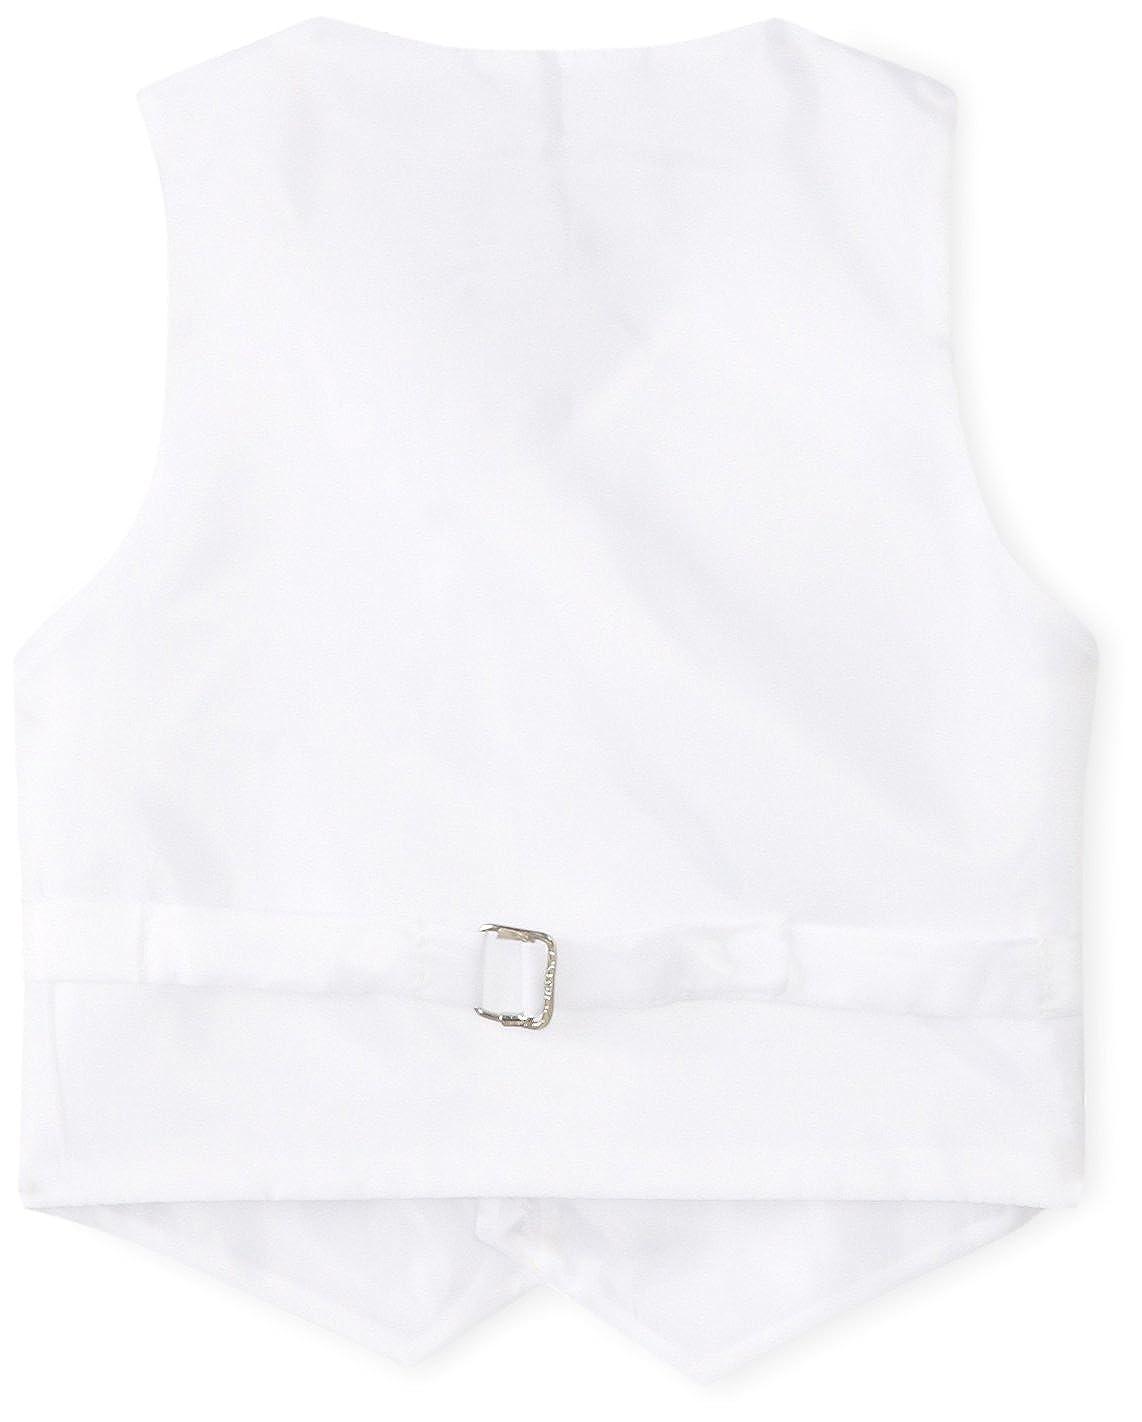 American Exchange Baby Boys Satin 4 Piece Vest Set